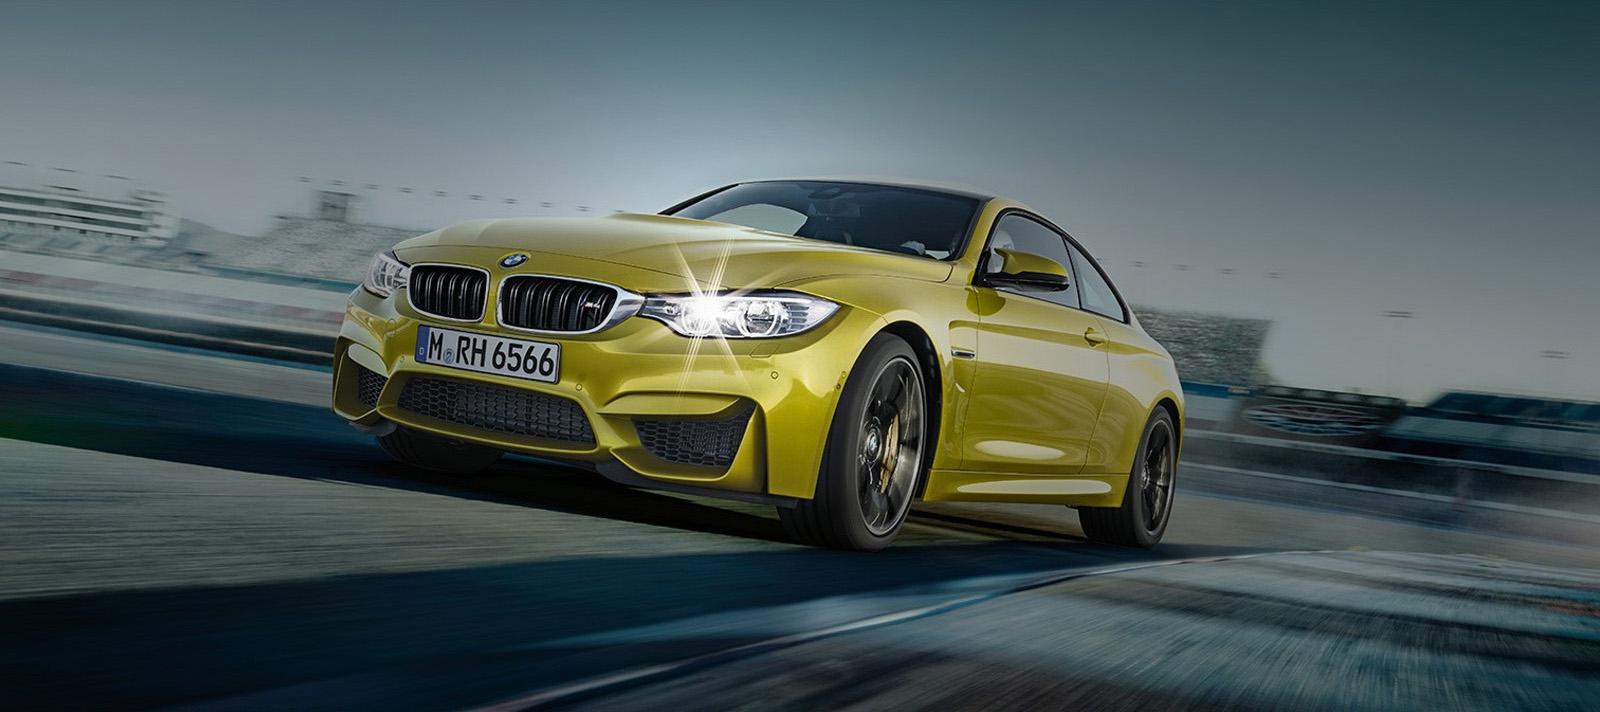 ECU Remaps | Engine Tuning | Audi, BMW, Mercedes Remapping